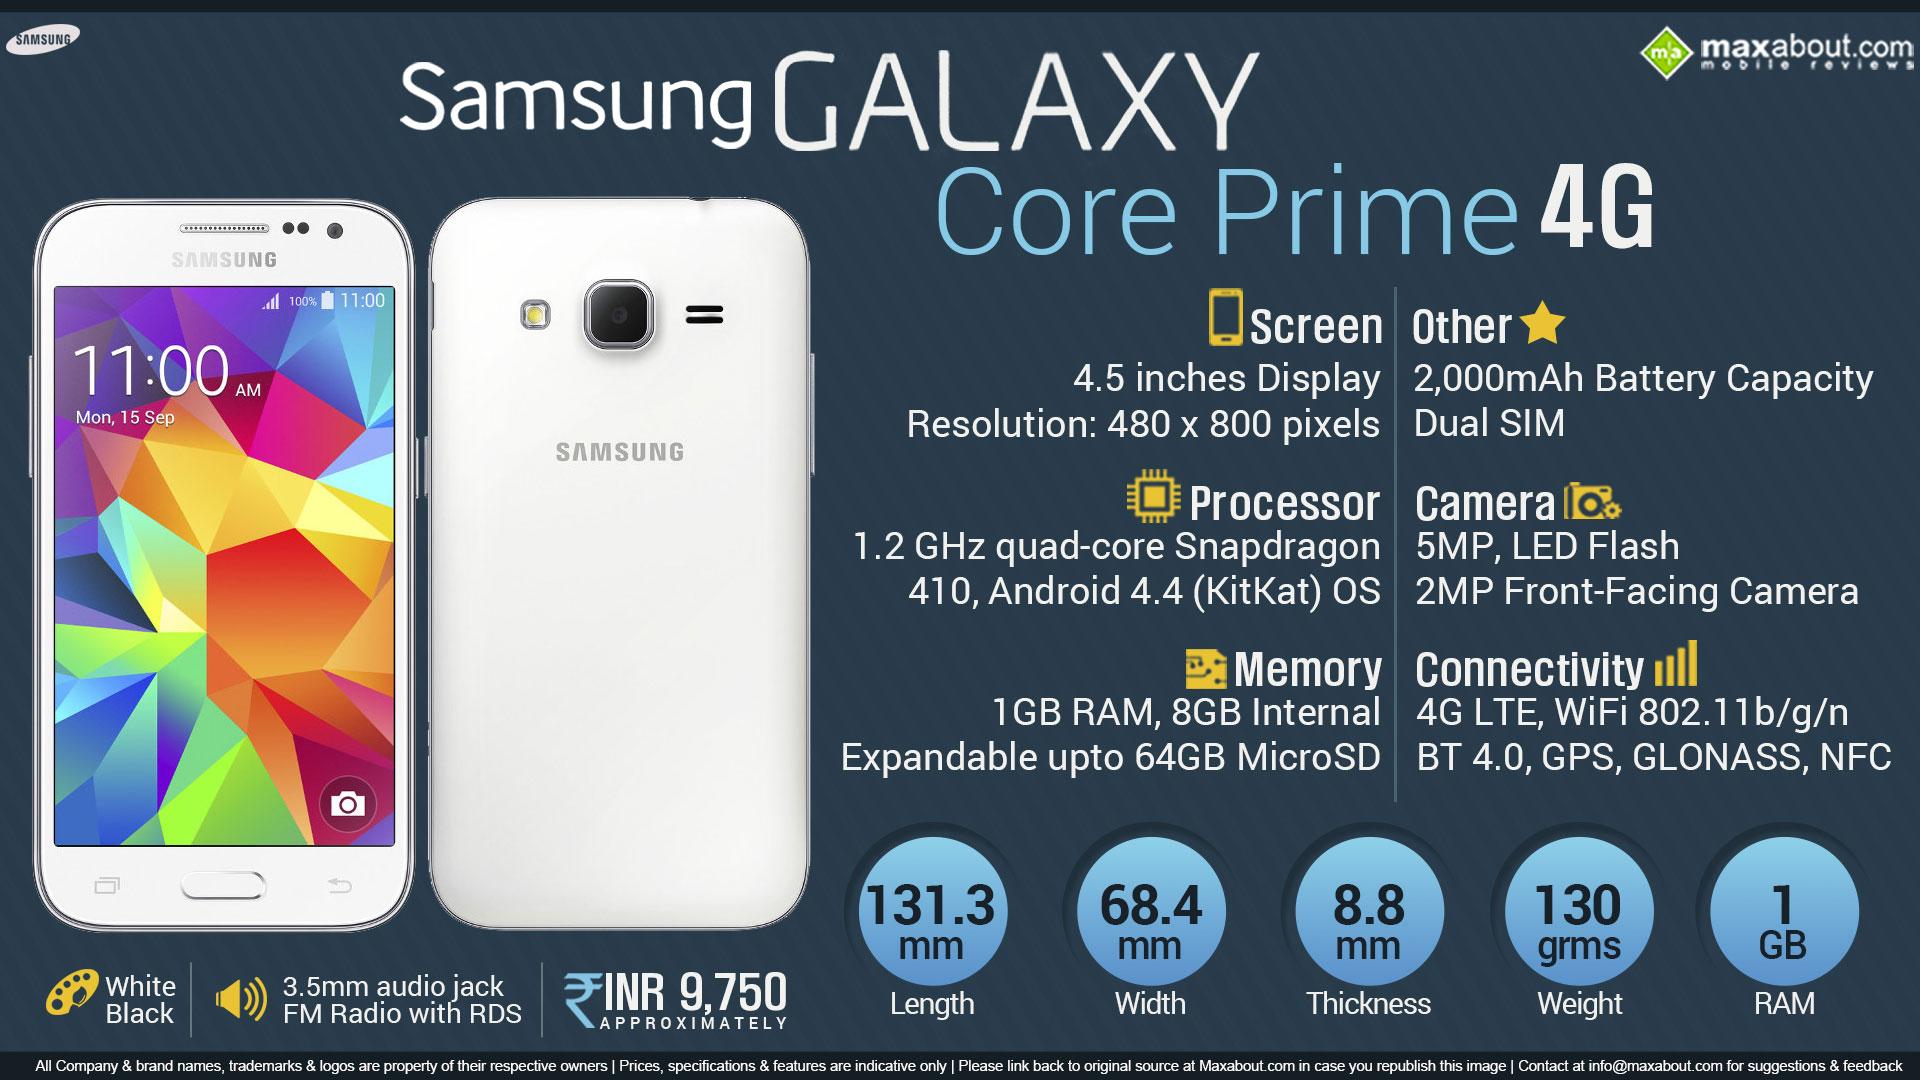 Quick Facts - Samsung Galaxy Core Prime 4G